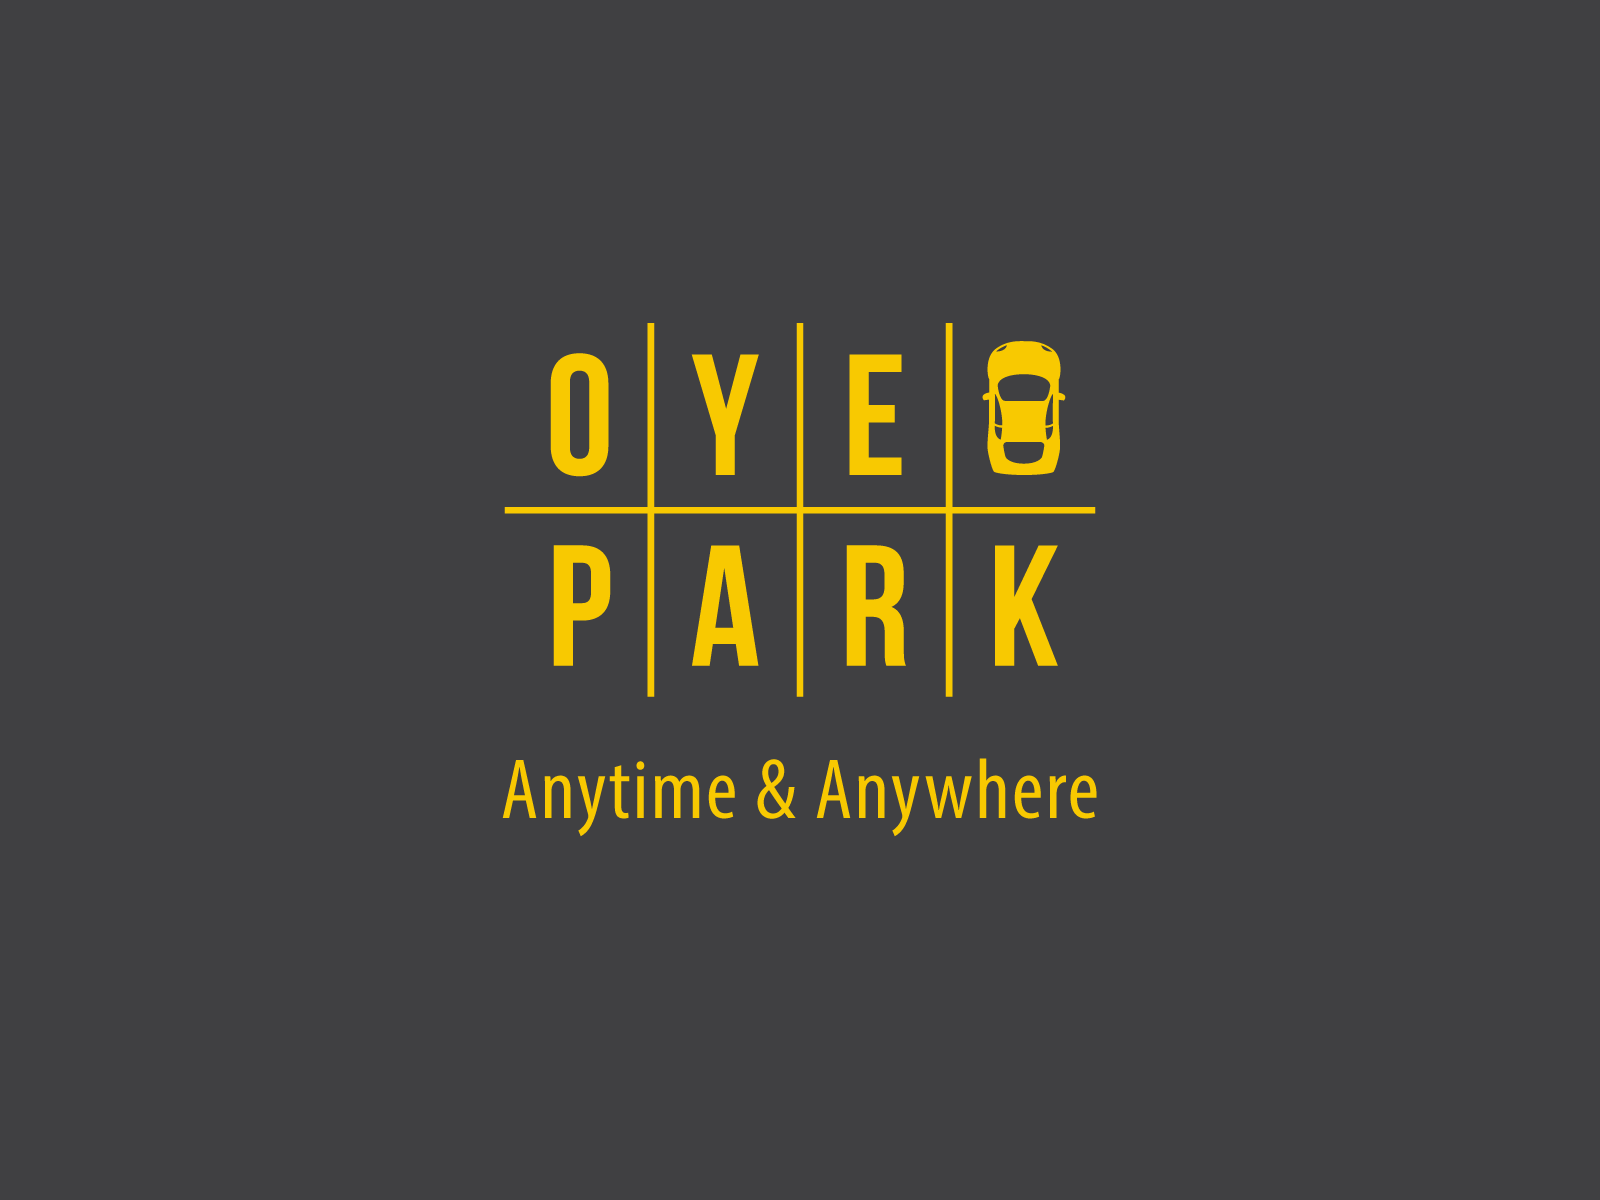 Oye park logo7